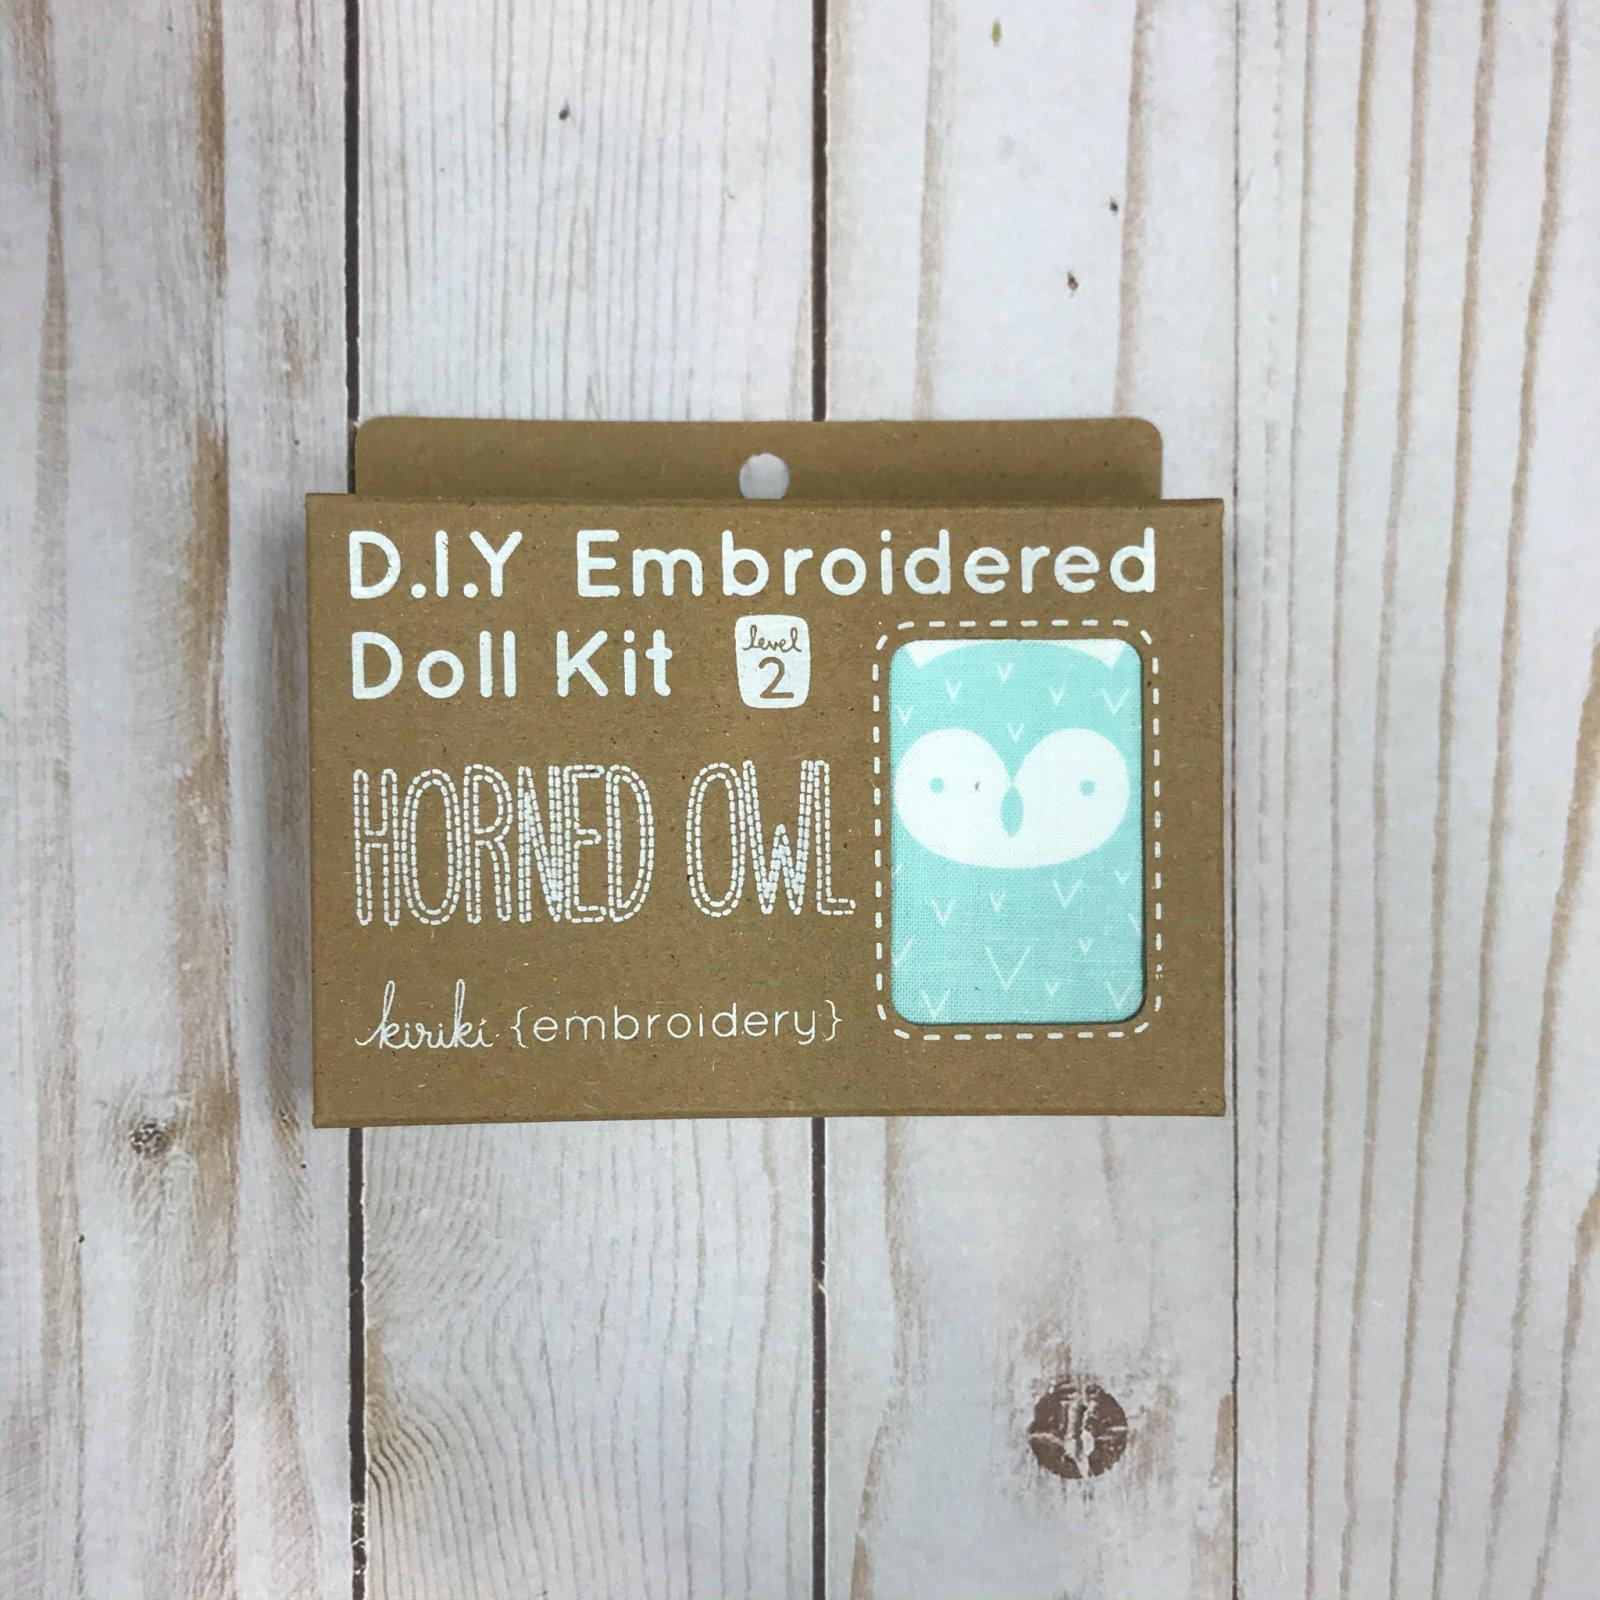 Embroidered Doll Kit - Level 2 - Horned Owl